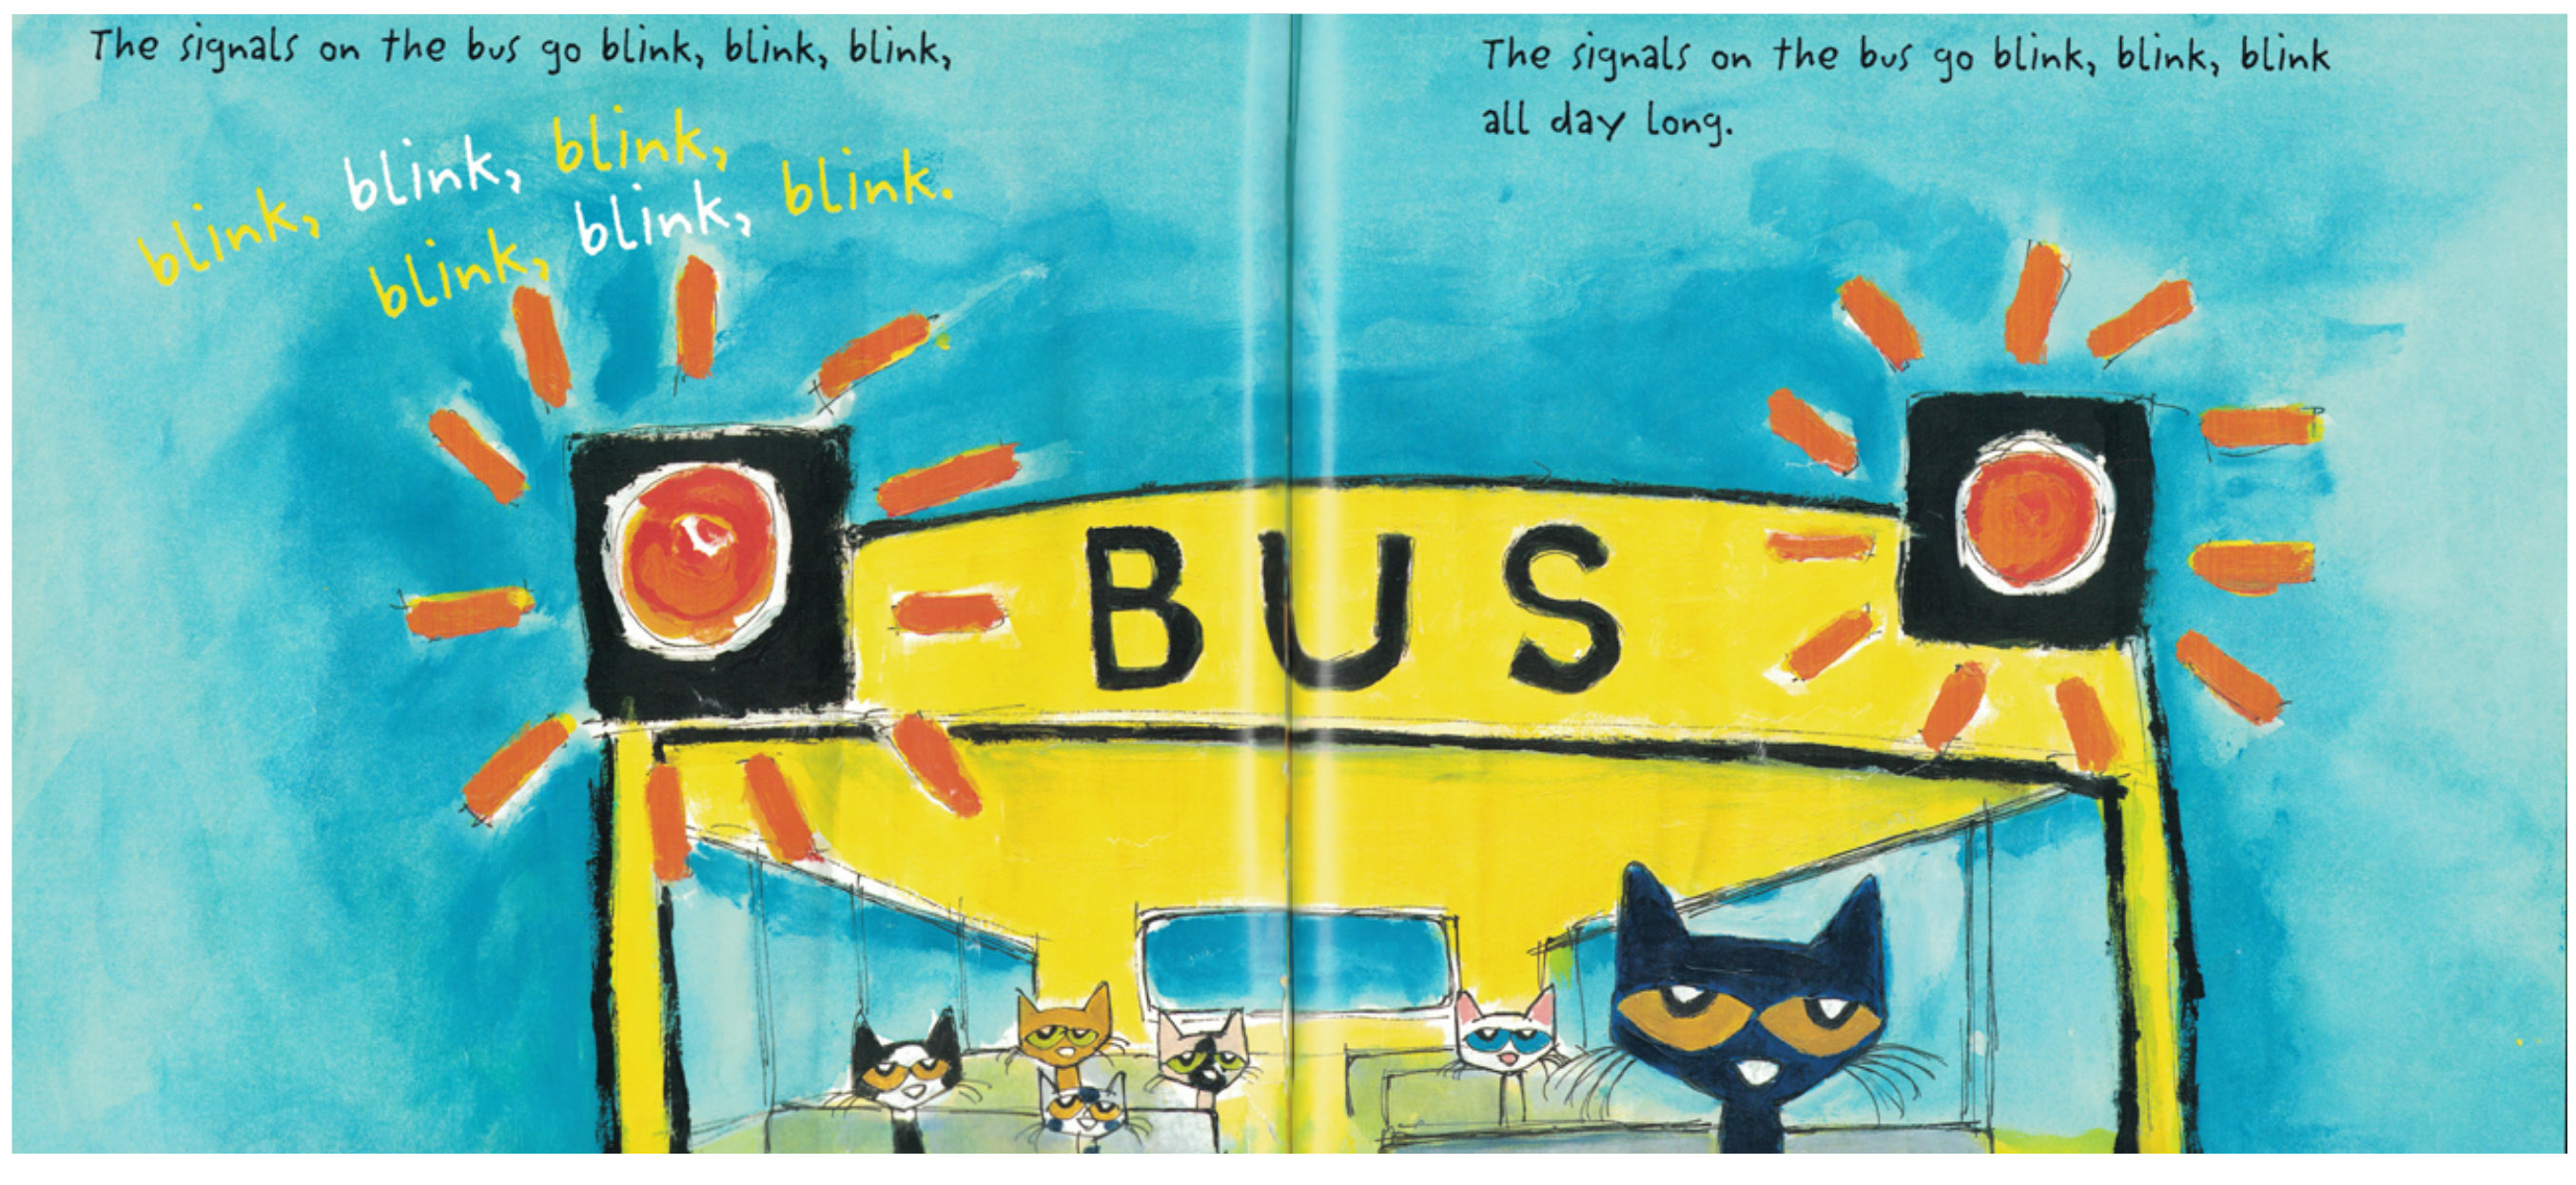 wheels-on-the-bus-interior